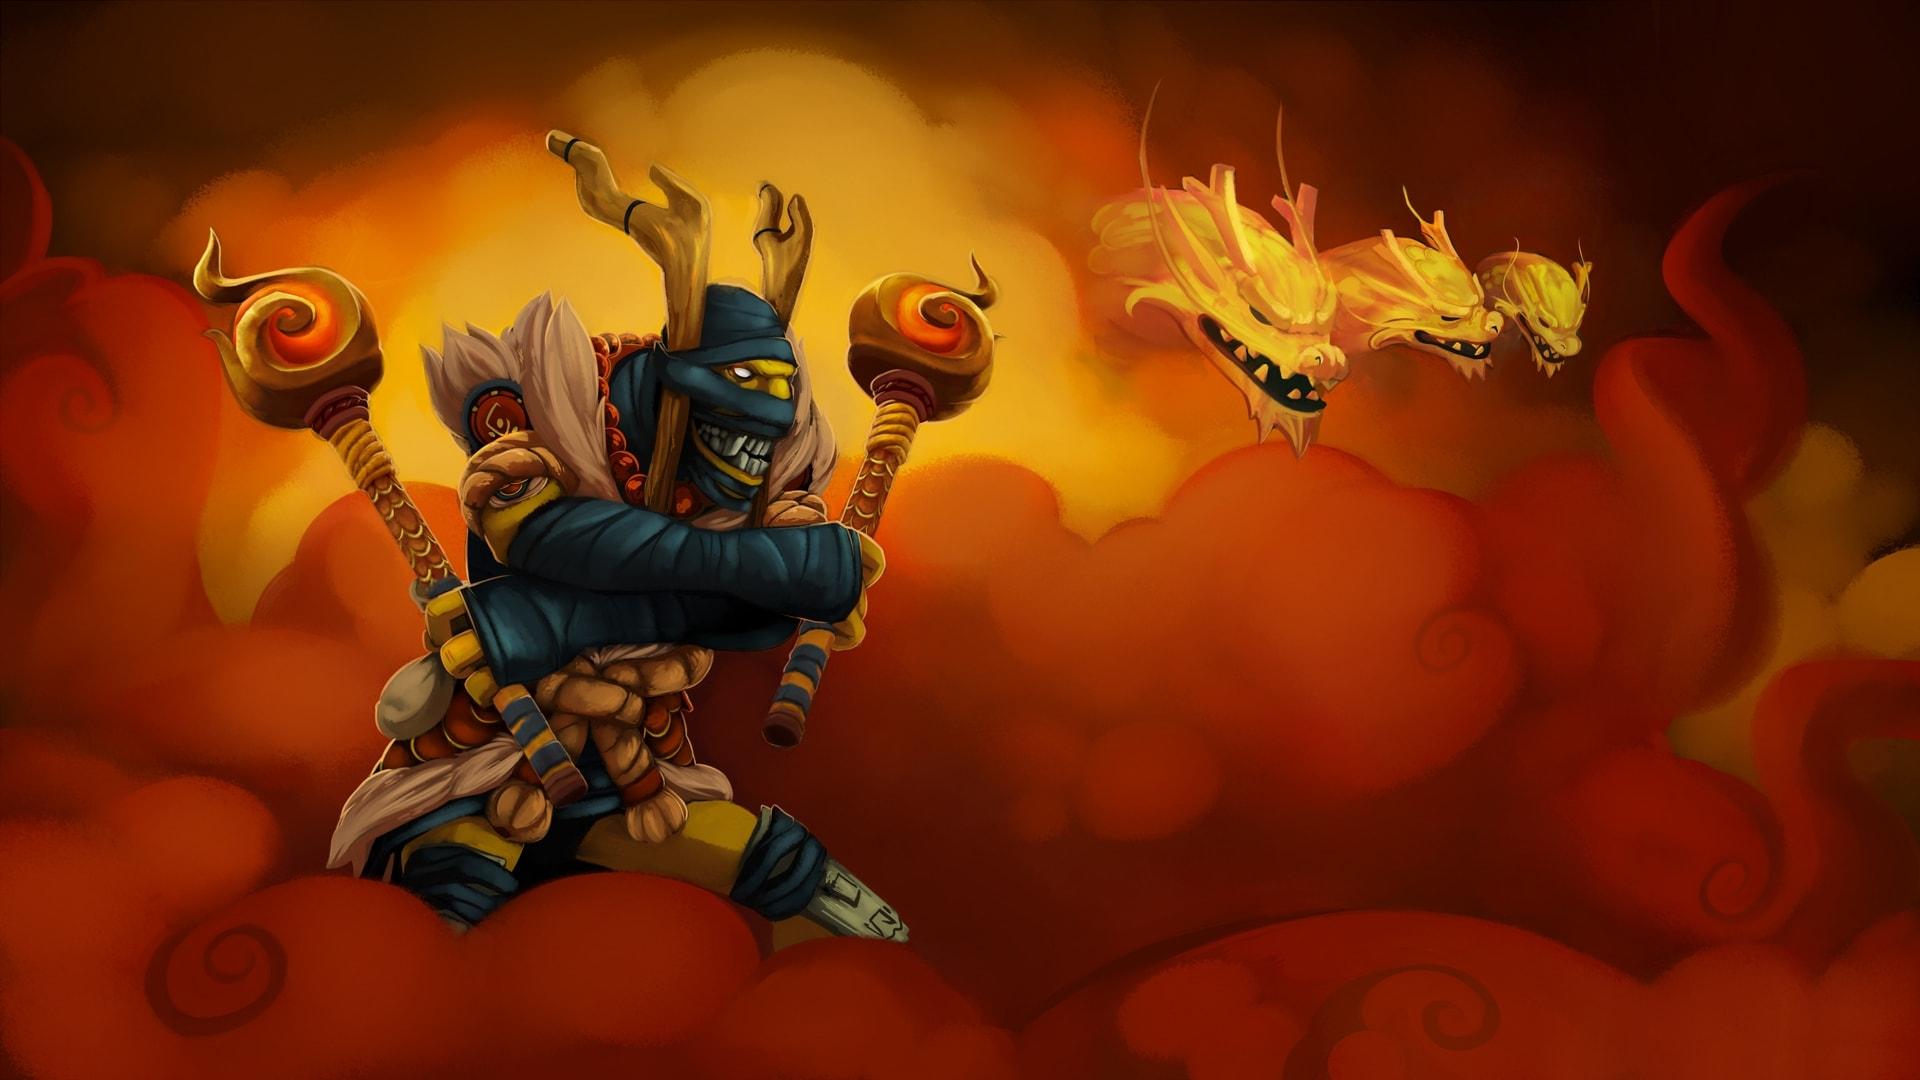 Dota2 : Shadow Shaman Wallpapers hd